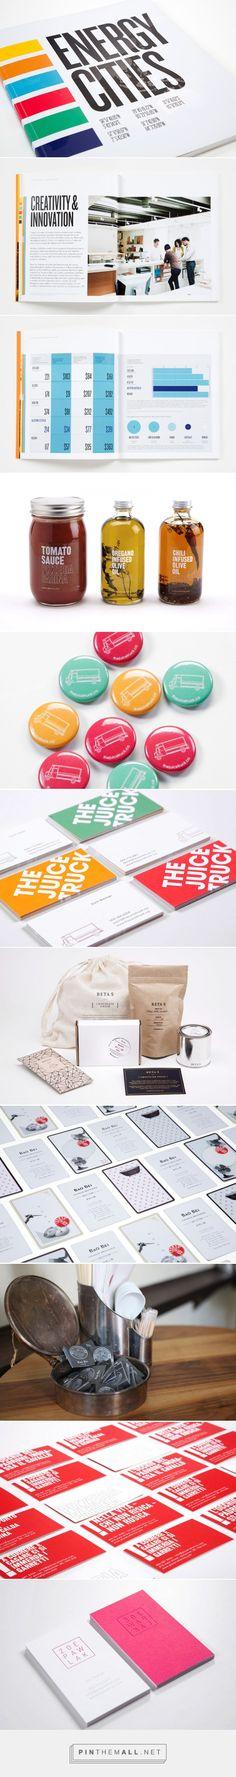 Graphic Design by Glasfurd & Walker – LooksLikeGoodDesign - created via https://pinthemall.net